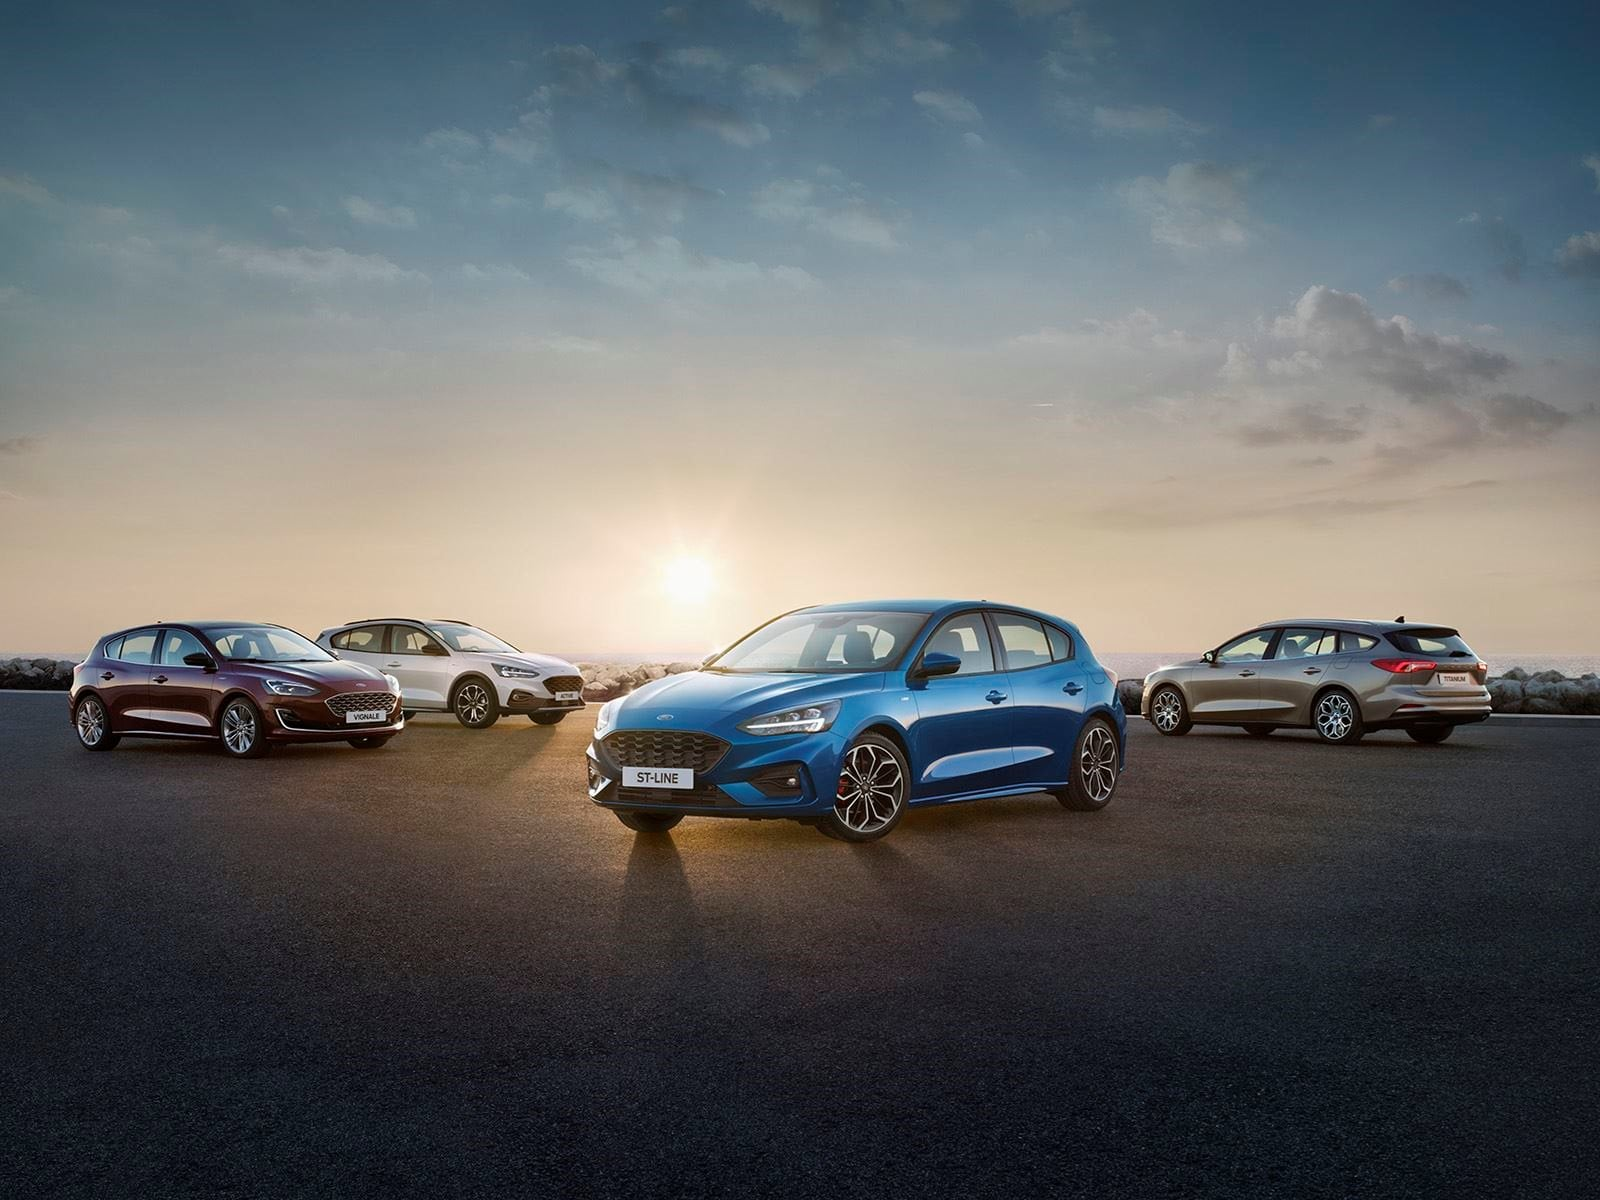 2019 Yeni Ford Focus MK4